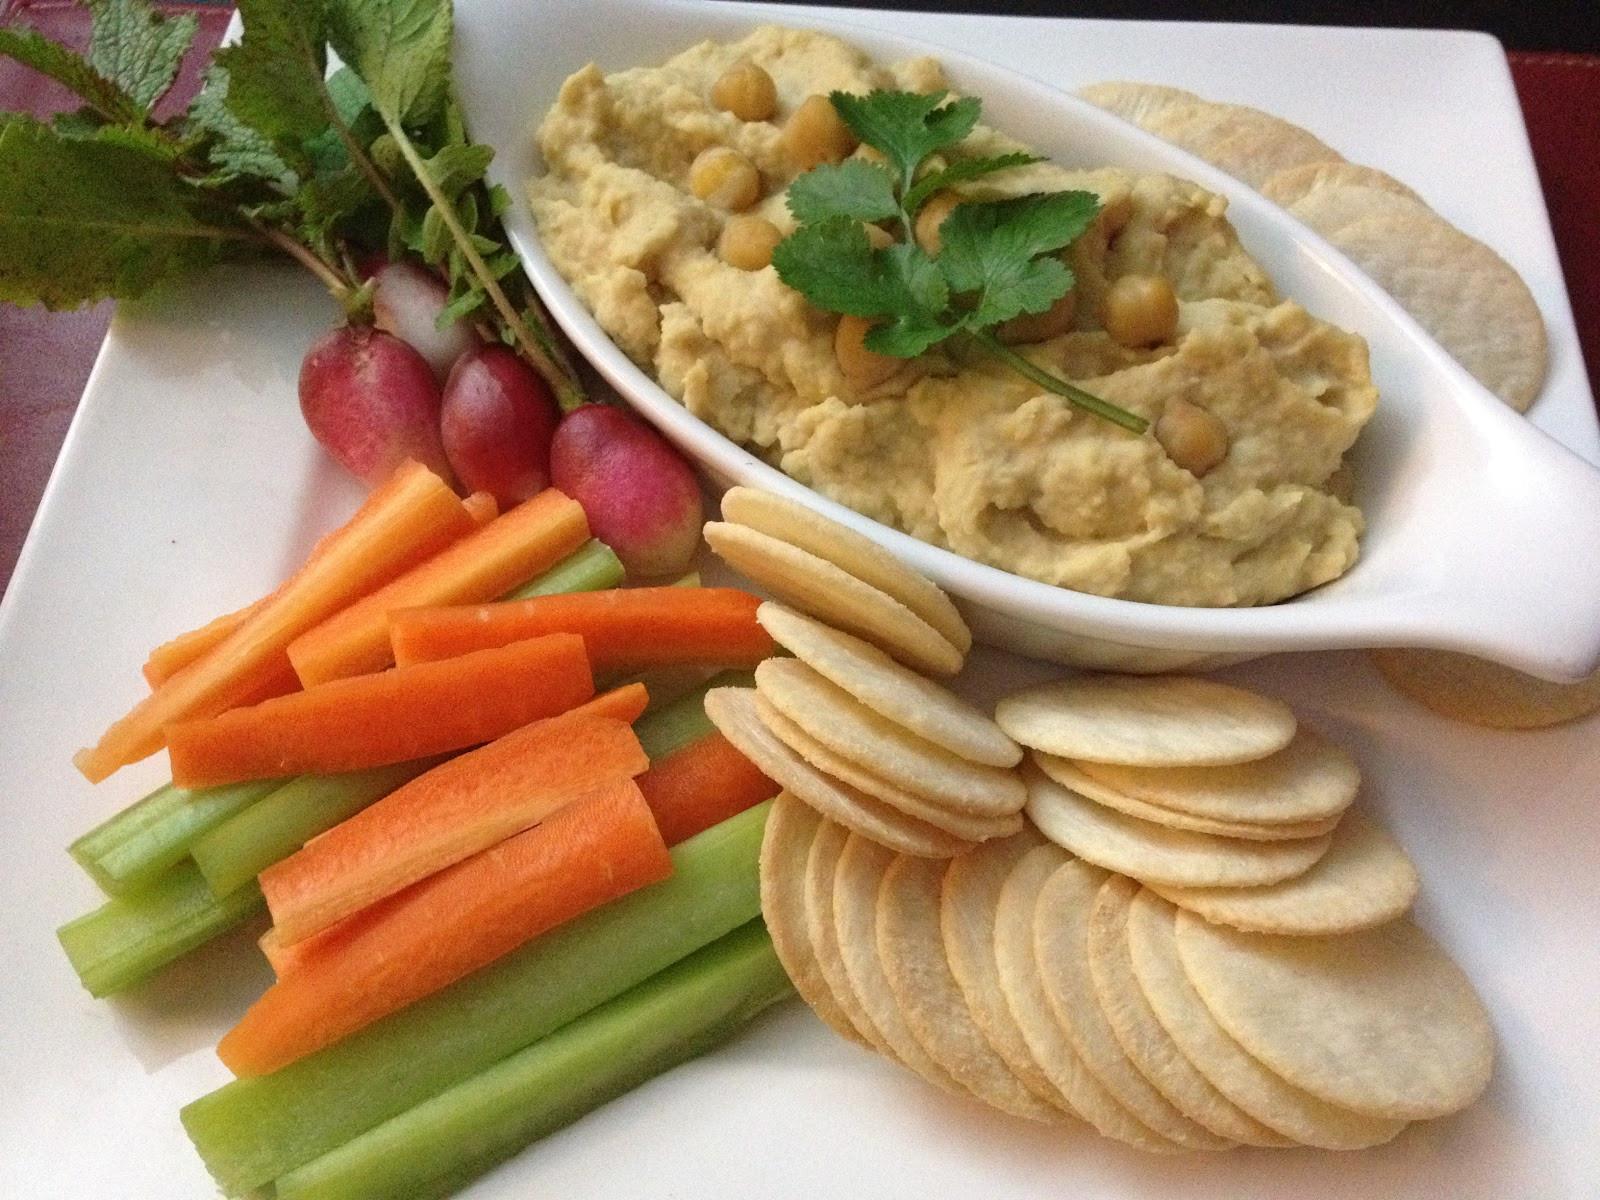 Pretzels Healthy Snack  Snacks on snacks — The Silhouette